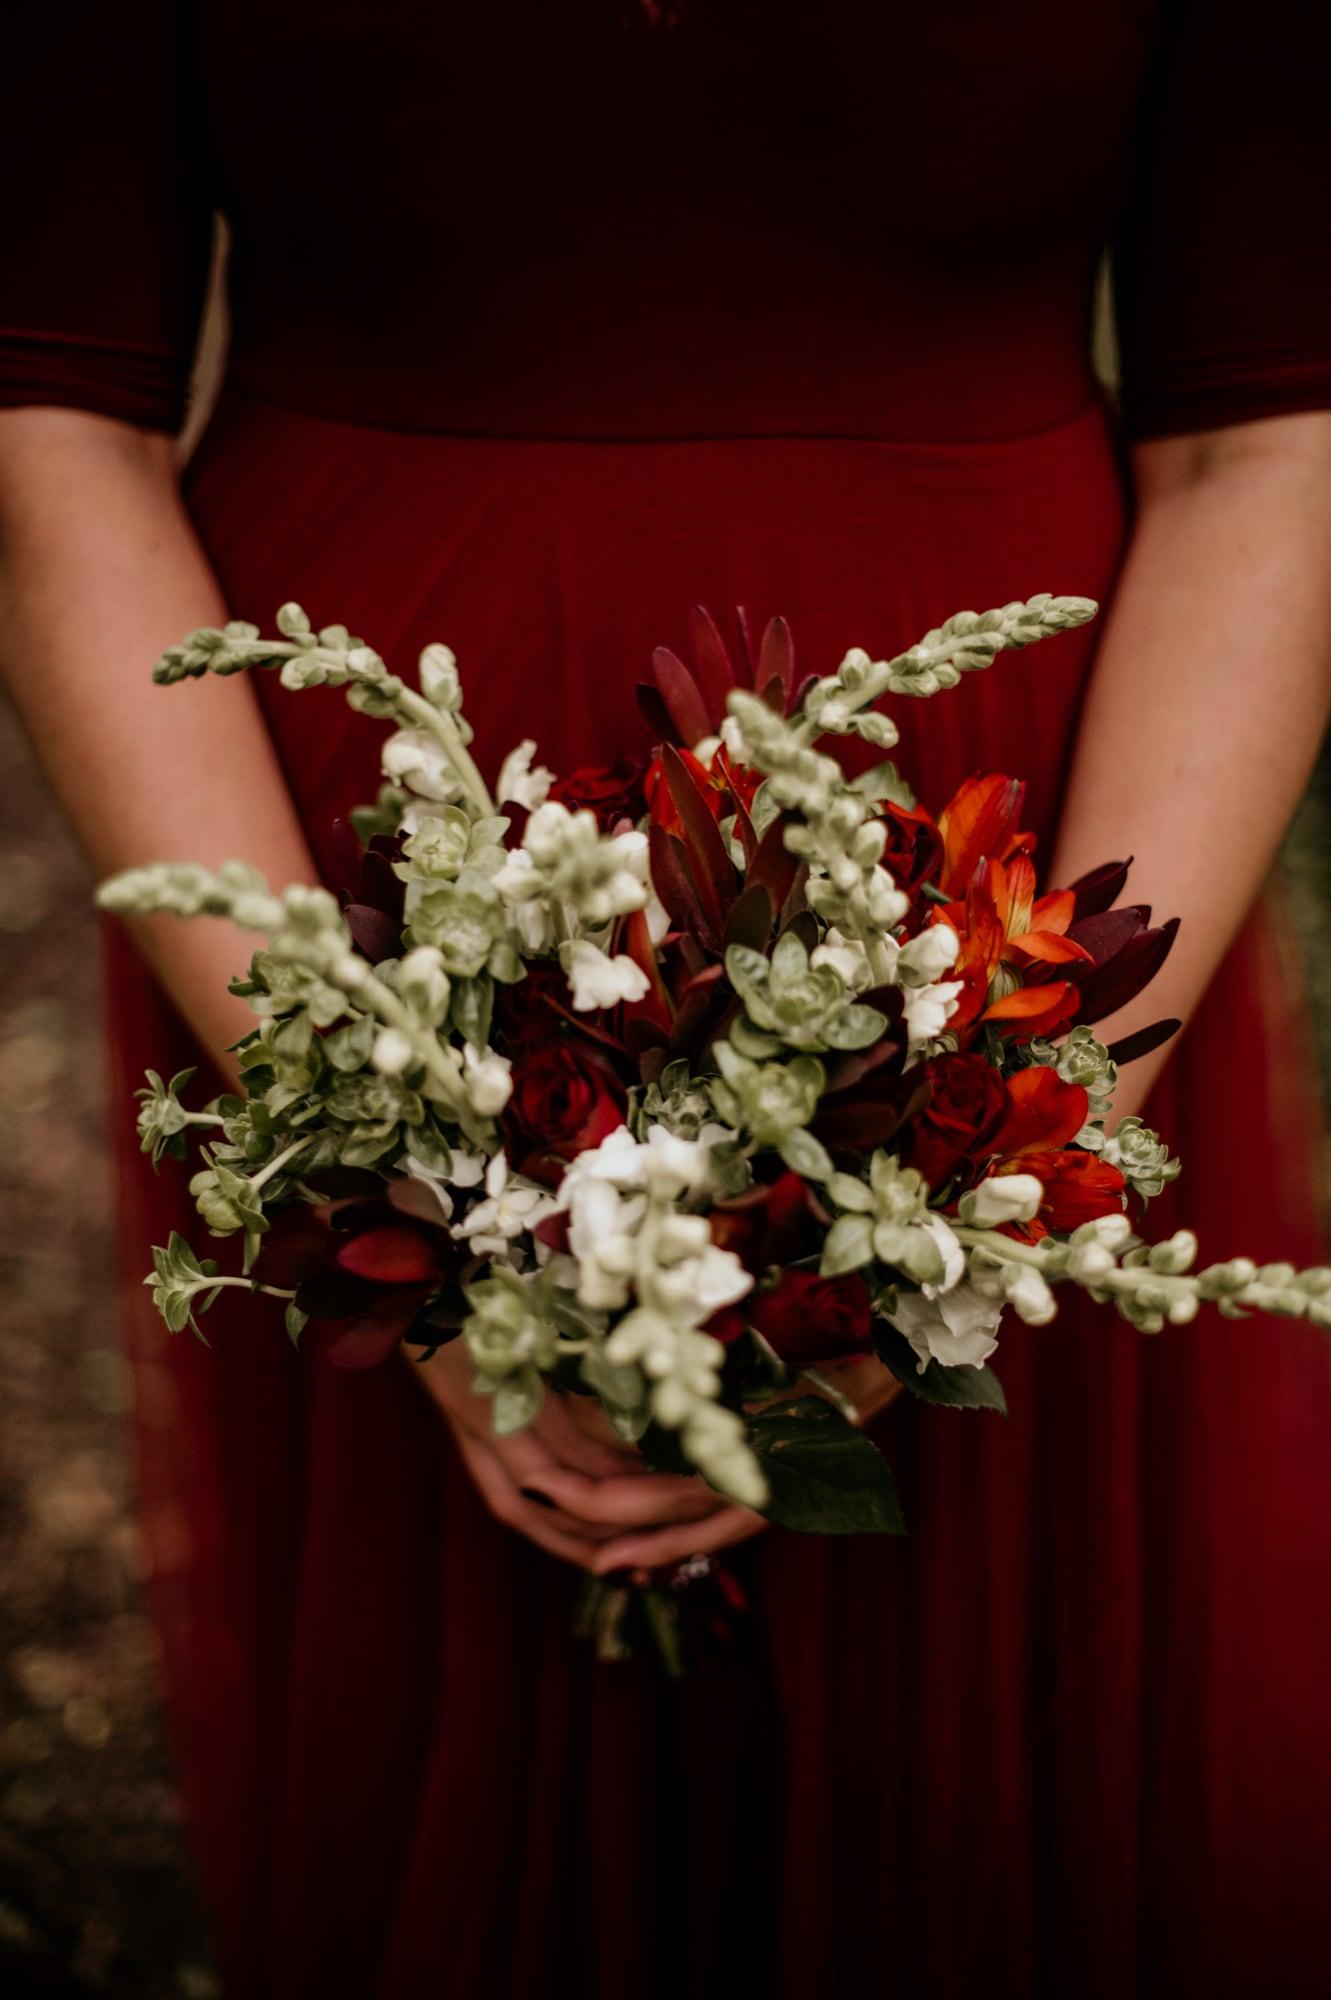 wesley-lanie-george-fernridge-engagement-June-Richards-Photography-Destination-Weddings-Elopements-Garden-Route-35